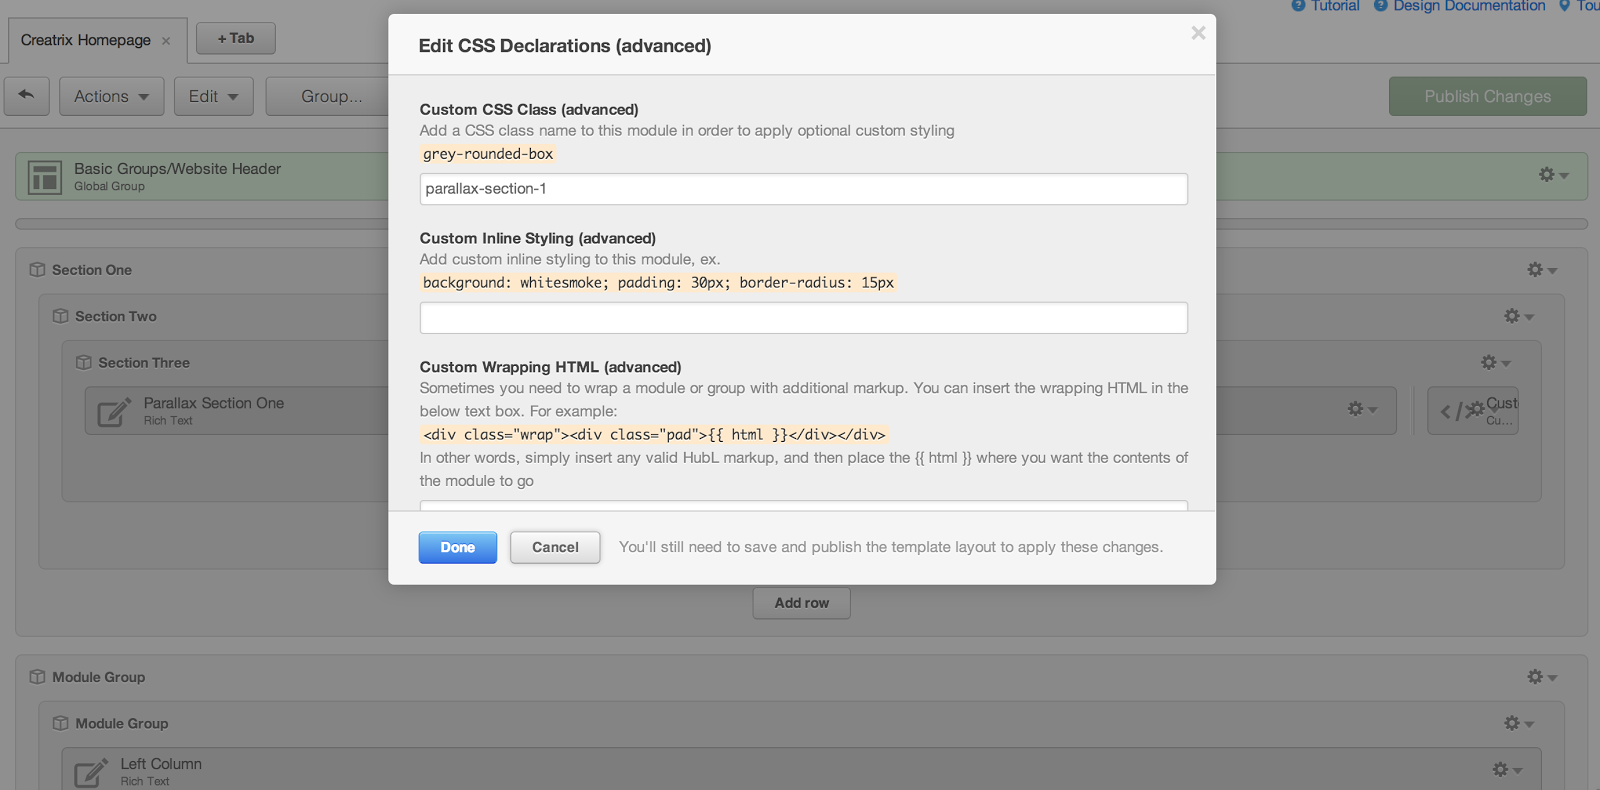 Add CSS Class